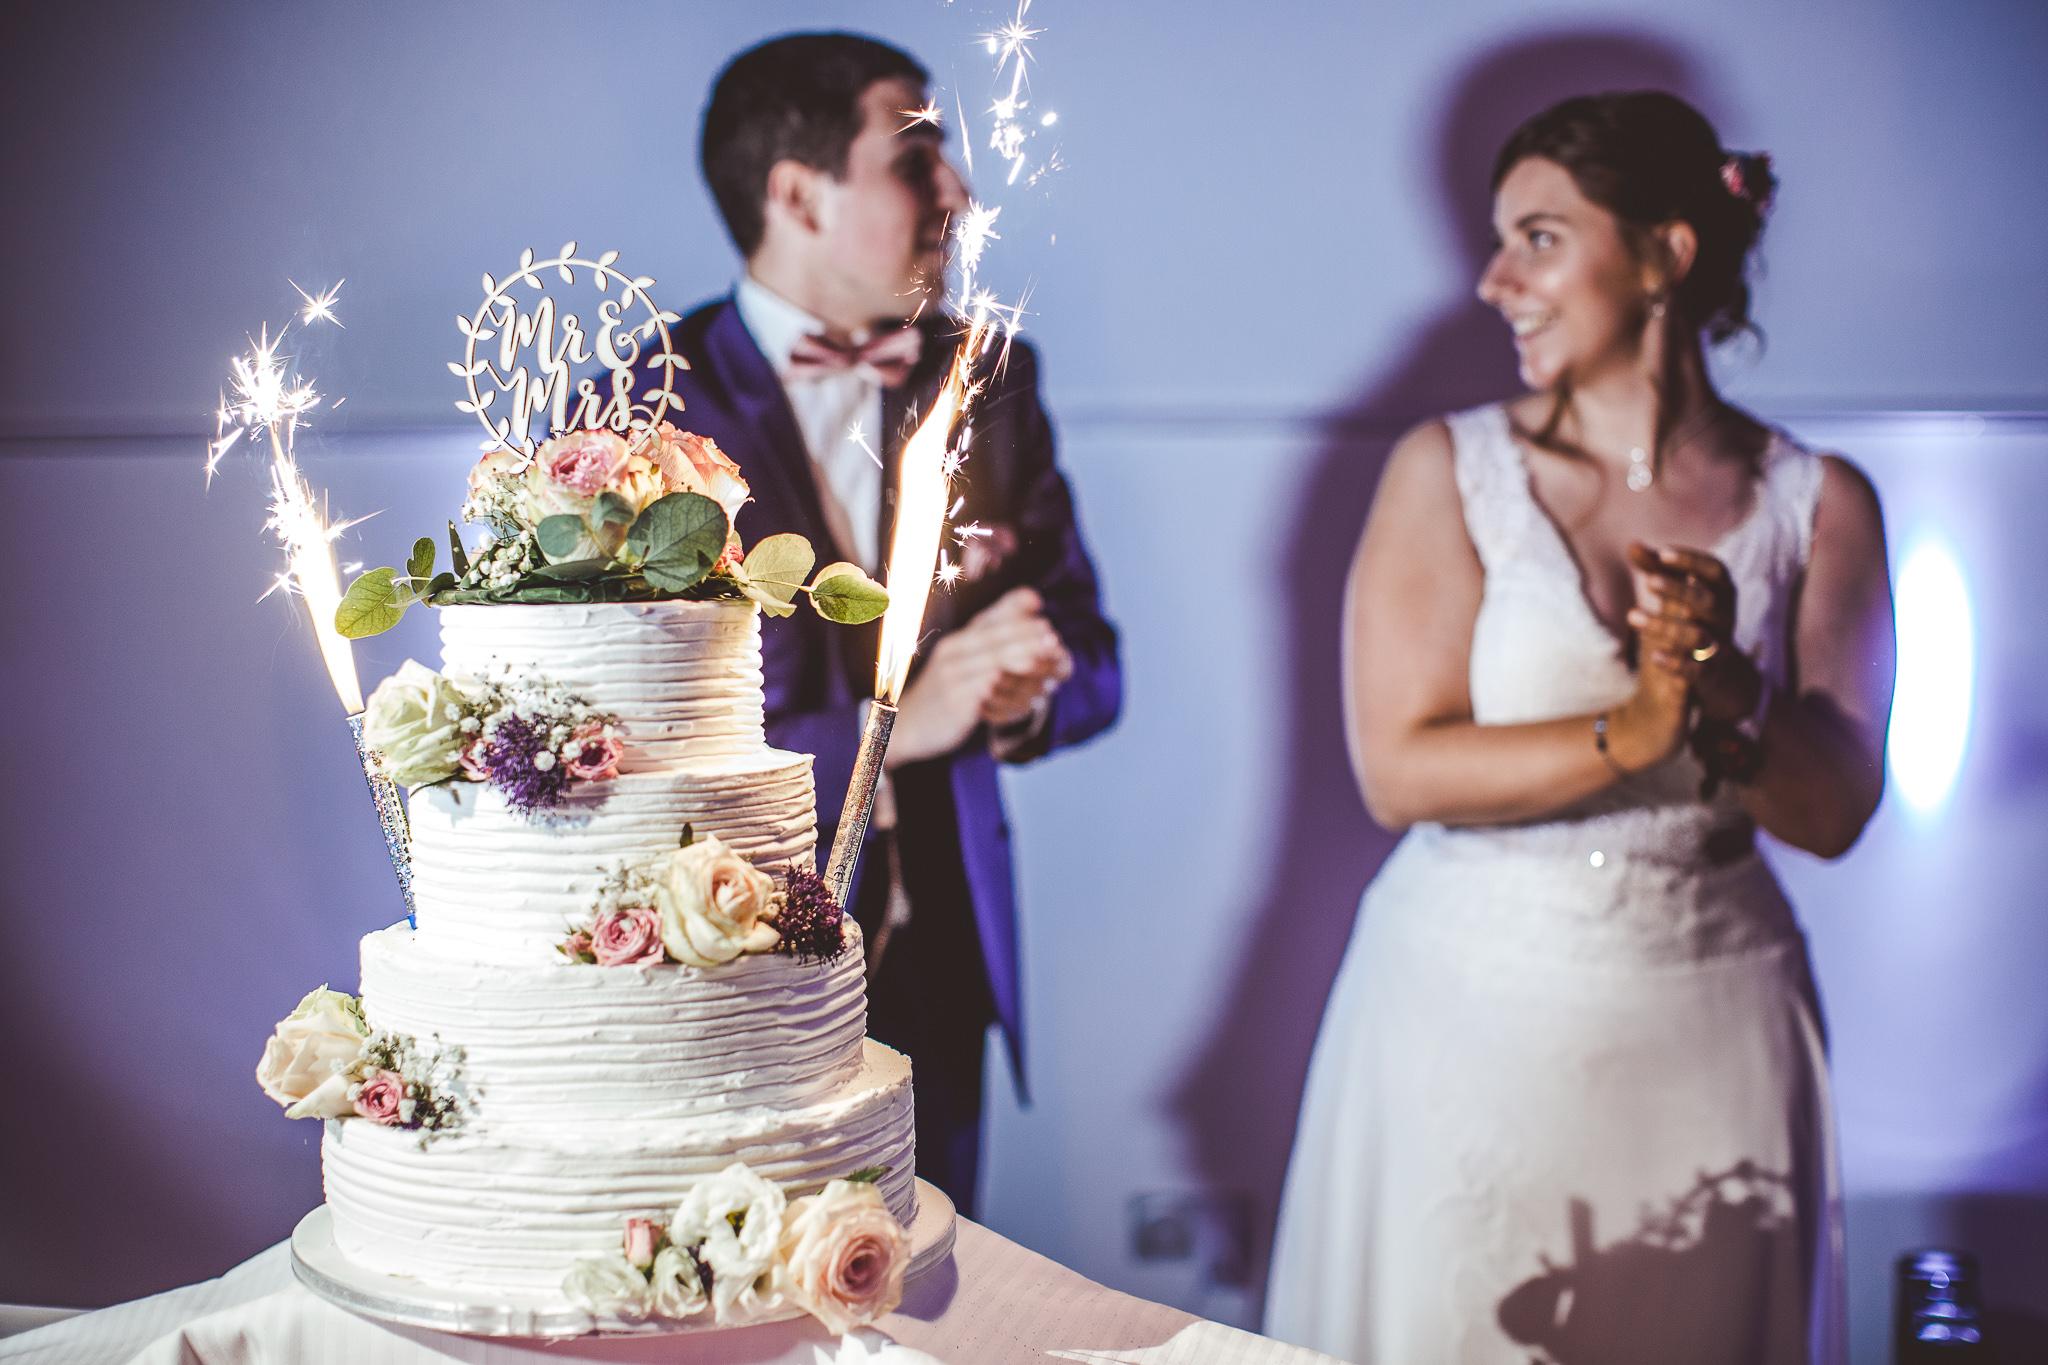 reportage mariage photo soiree gateau maries mas tolosa plaisance du touch